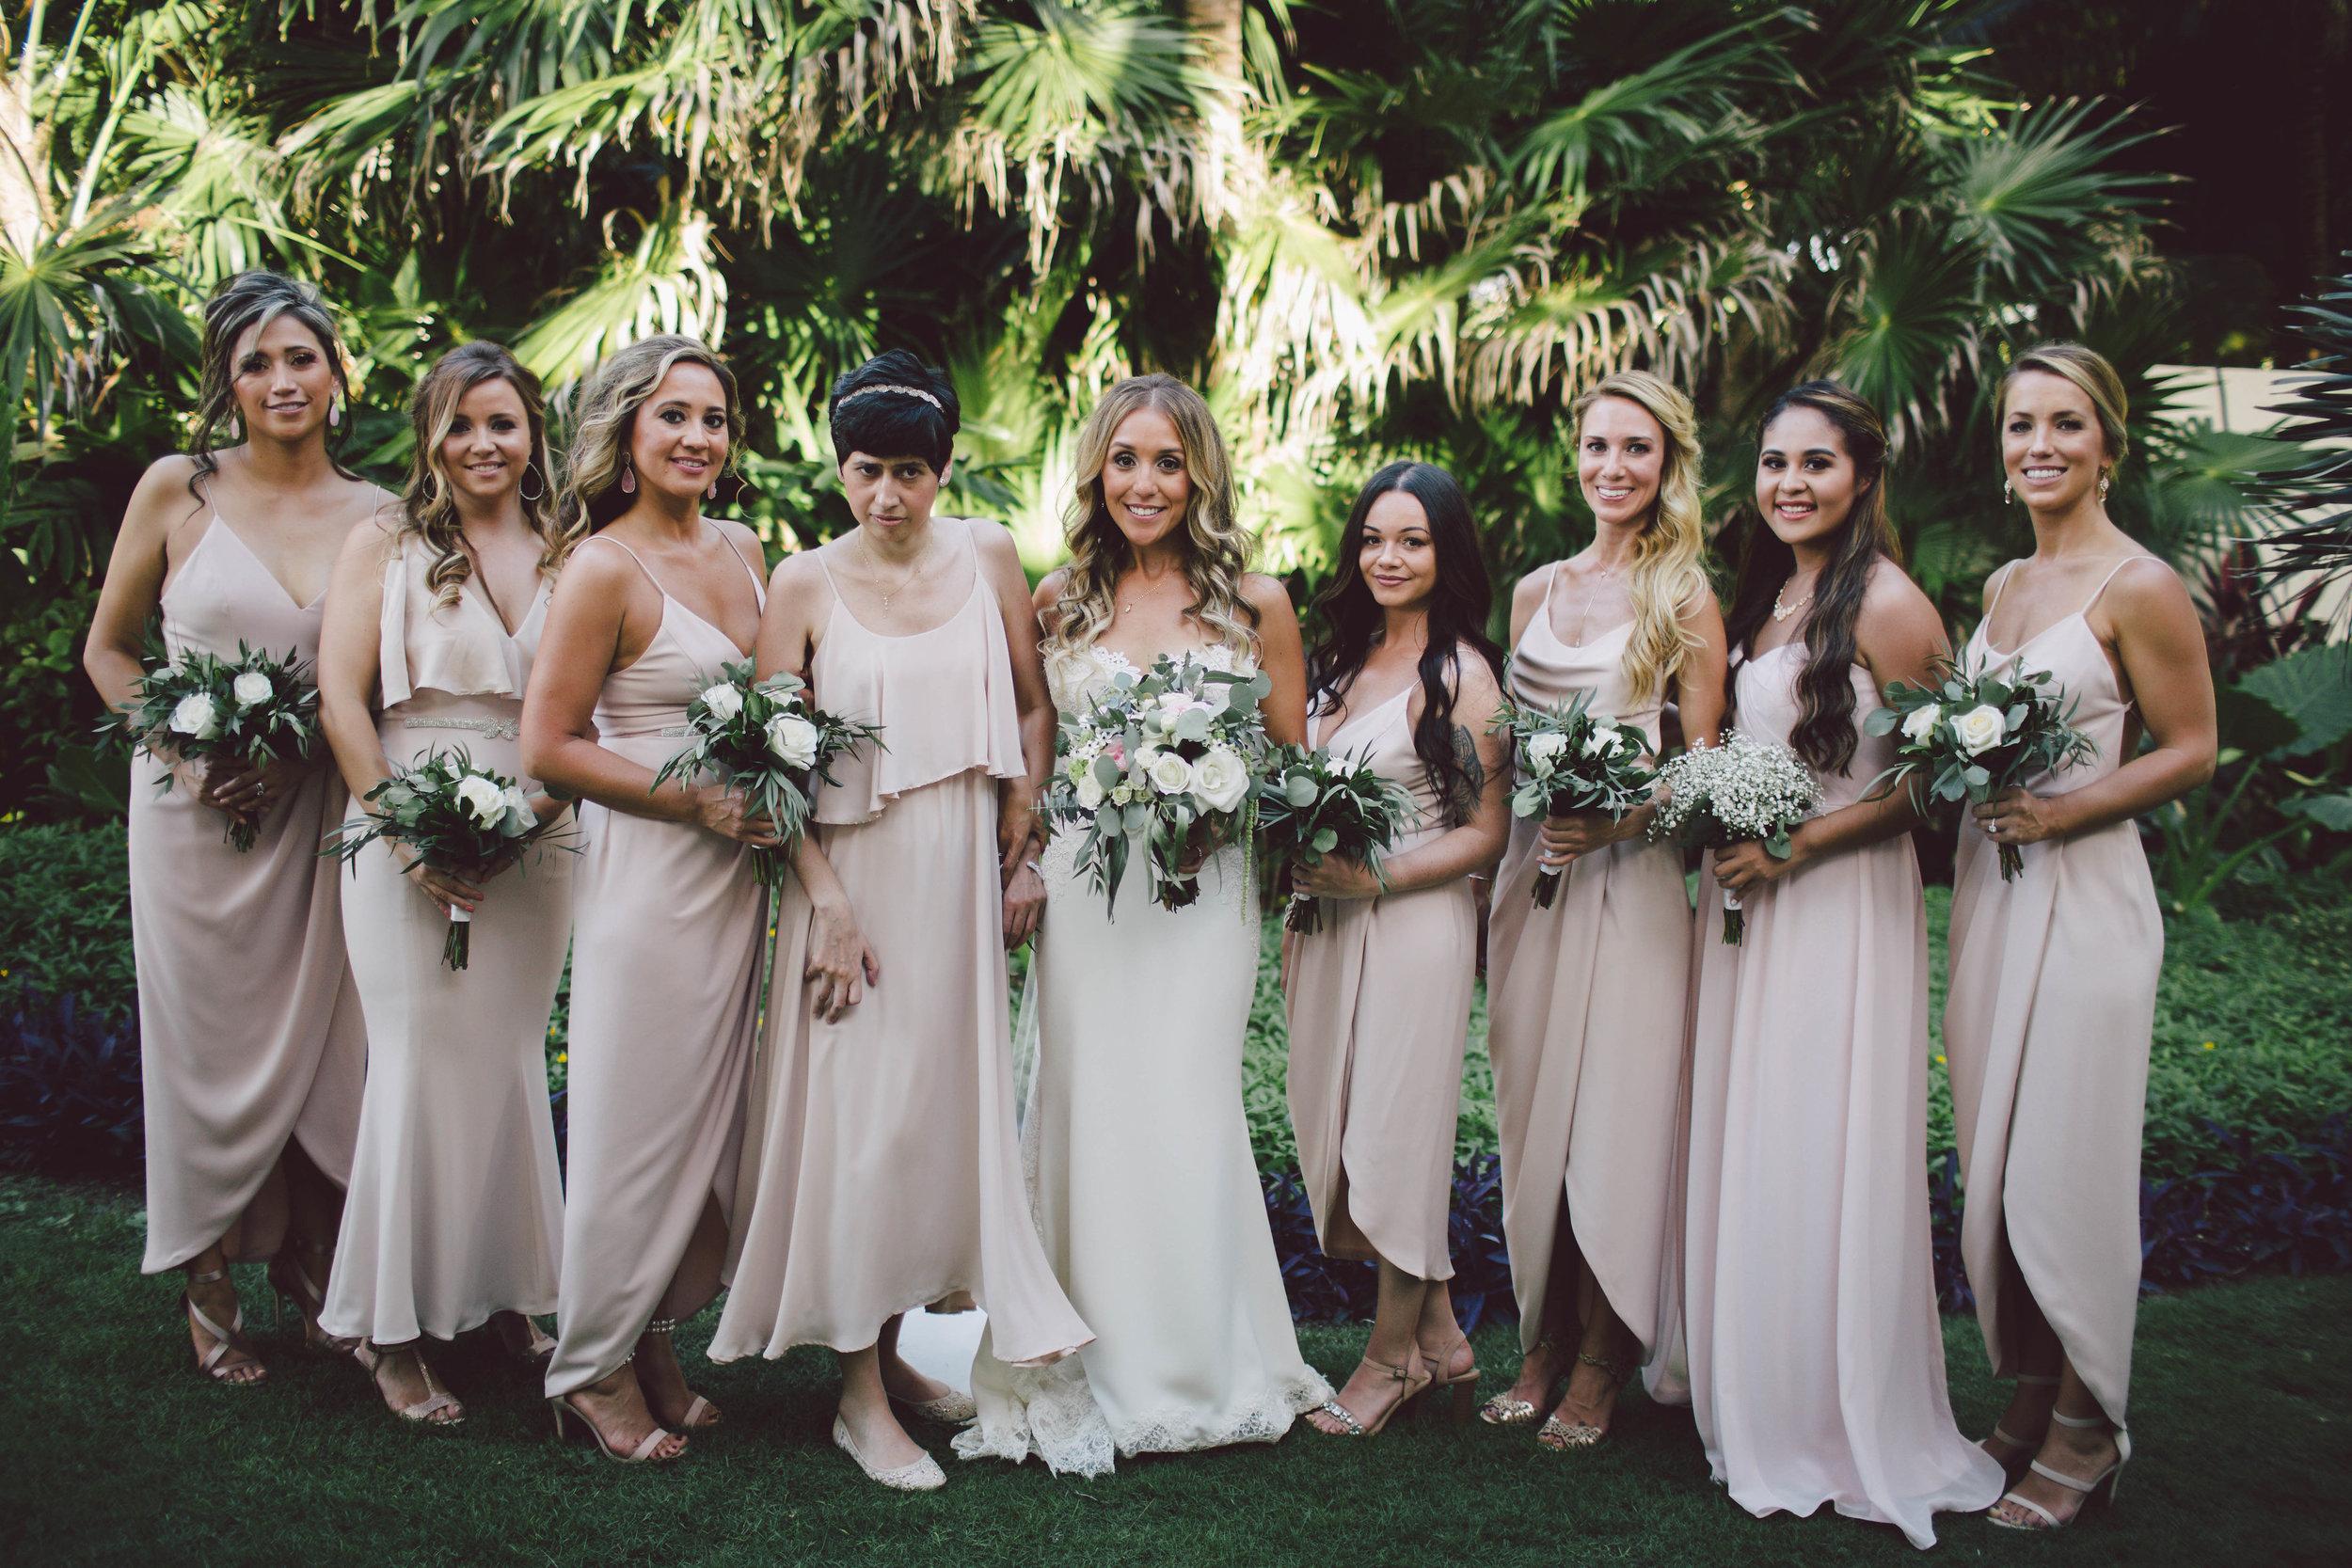 mexico_wedding_cancun_villa_la_joya_evangeline_lane_075.jpg